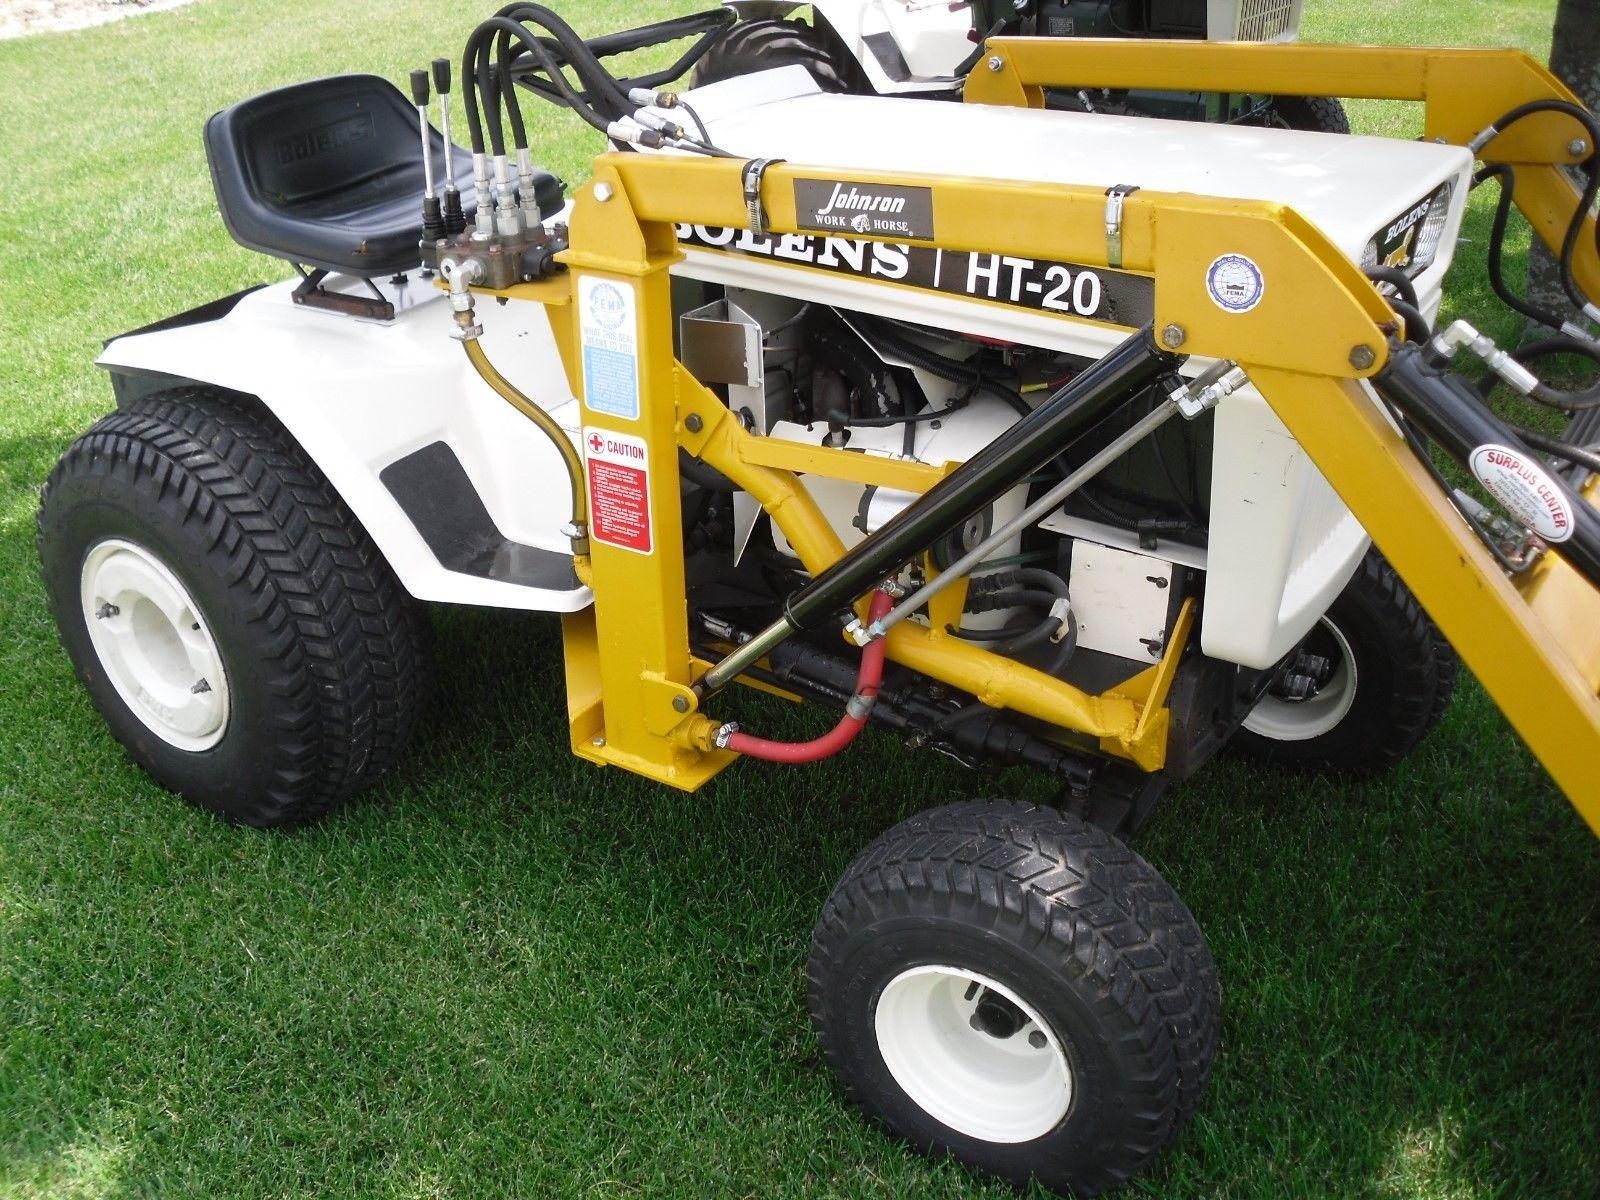 Bolens Ht 20 Garden Tractor With Loader Ebay Garden Tractors